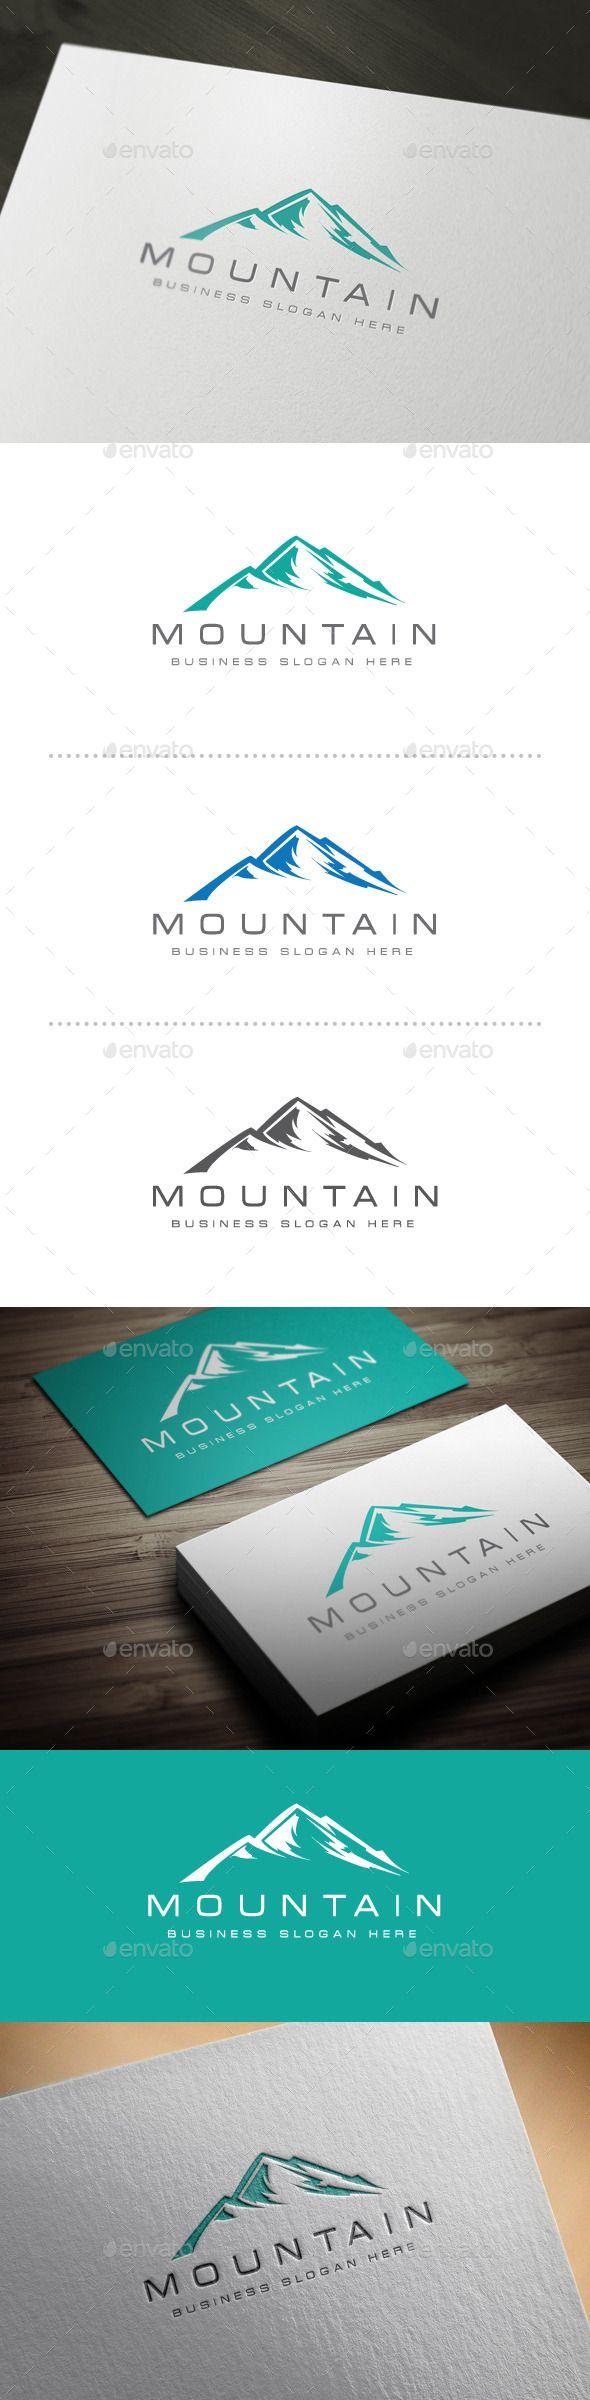 Mountain  Logo Design Template Vector #logotype Download it here: http://graphicriver.net/item/mountain-logo/10521578?s_rank=1365?ref=nexion